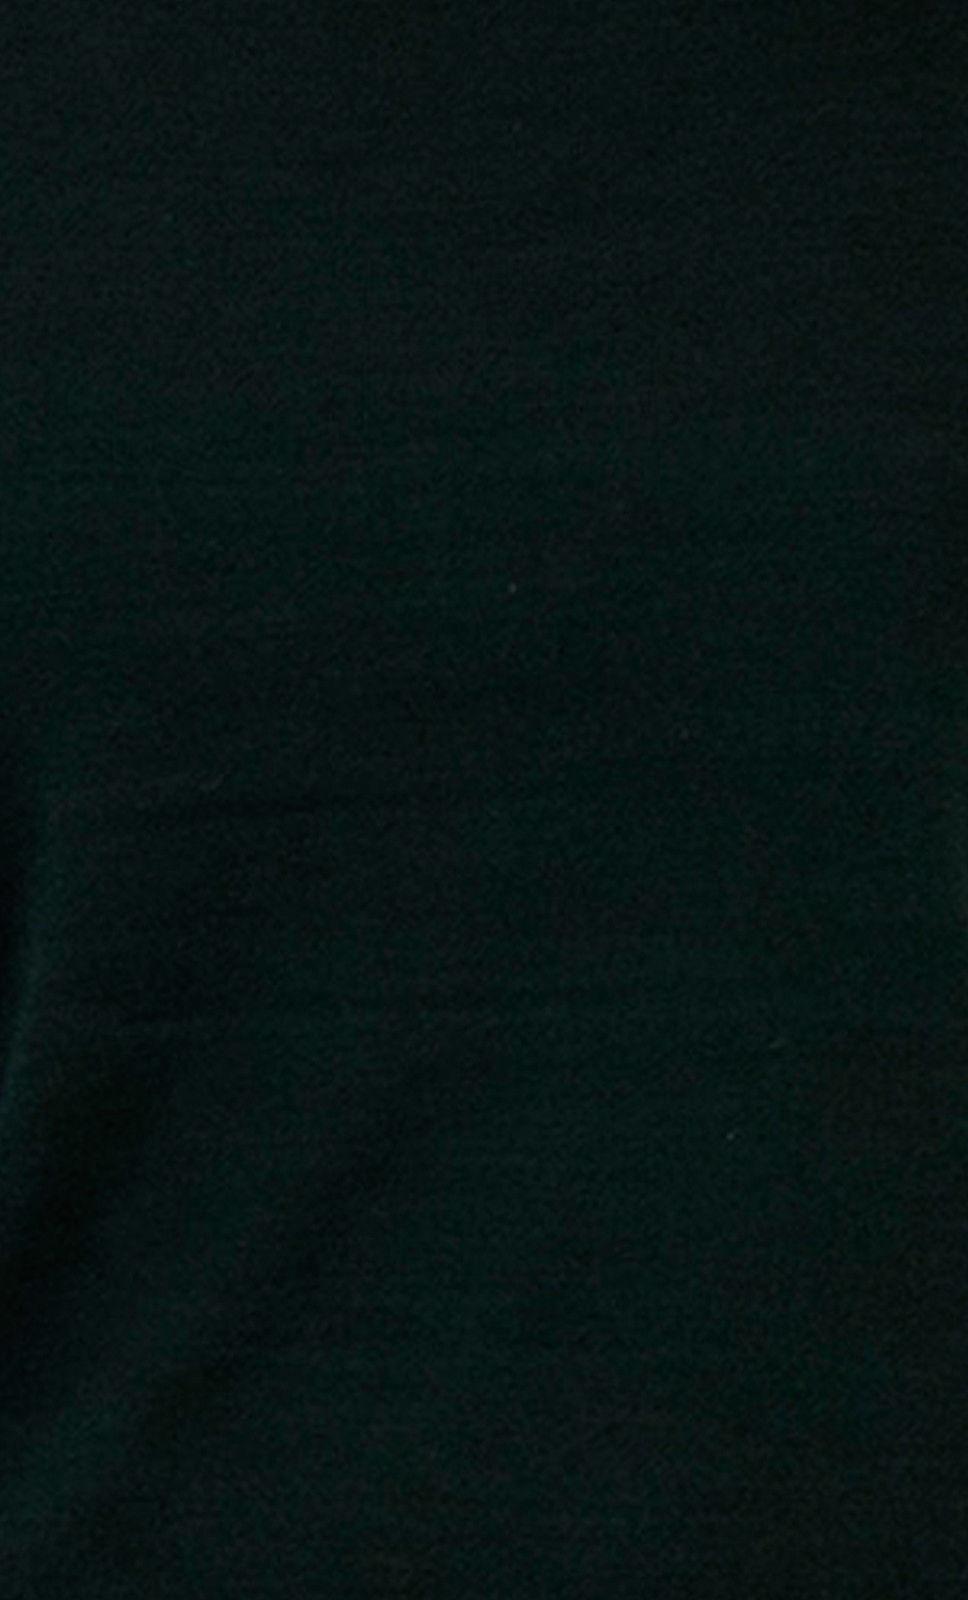 Cottonclub-Sycamore-Green